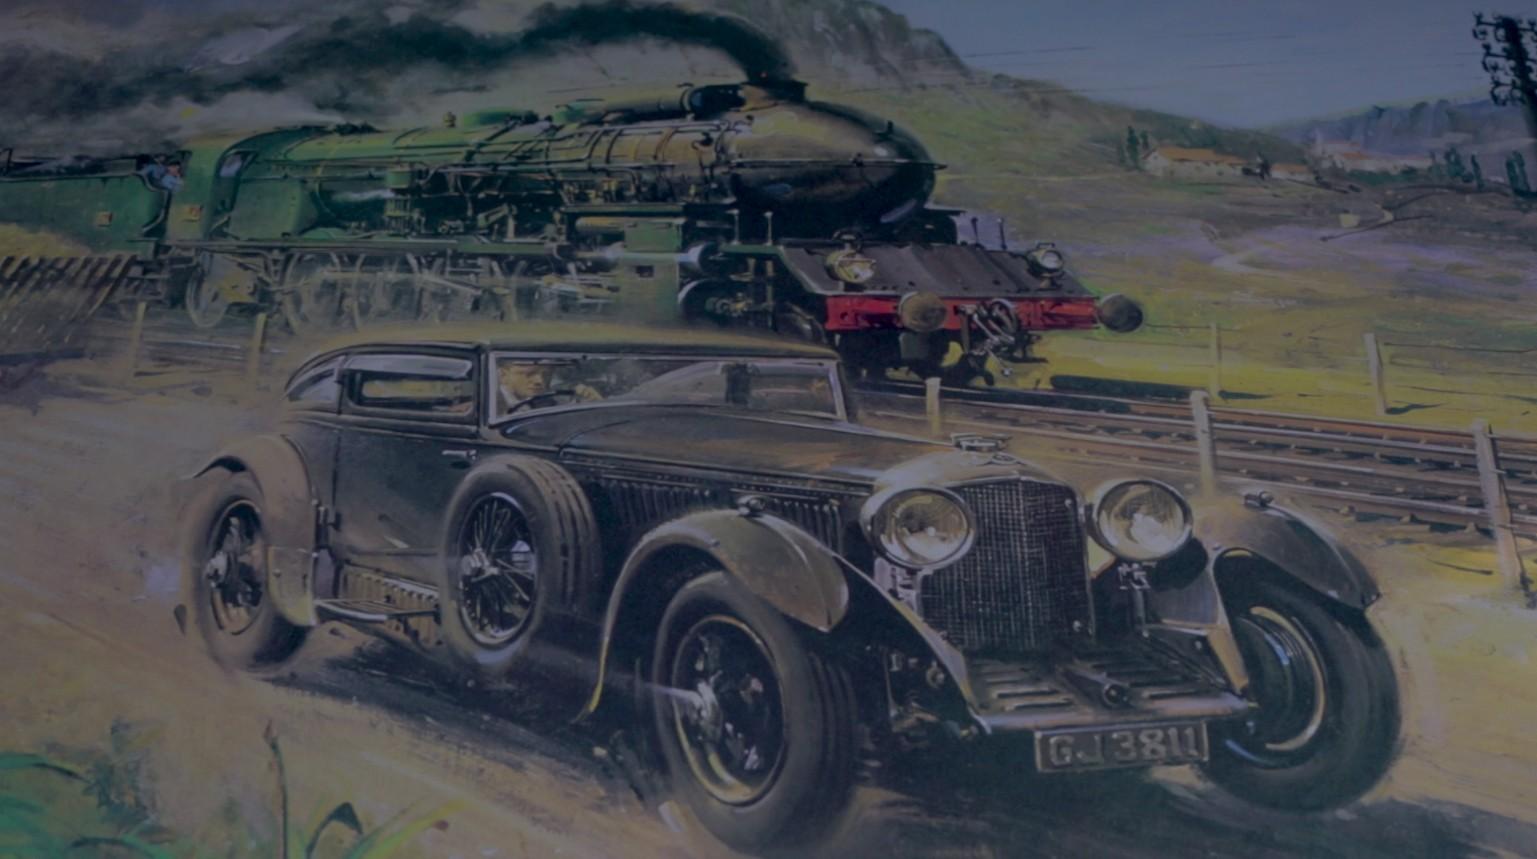 Bentley Continental Gt Races Saudi Arabia S Desert Train In Train Blue Race Reenactment